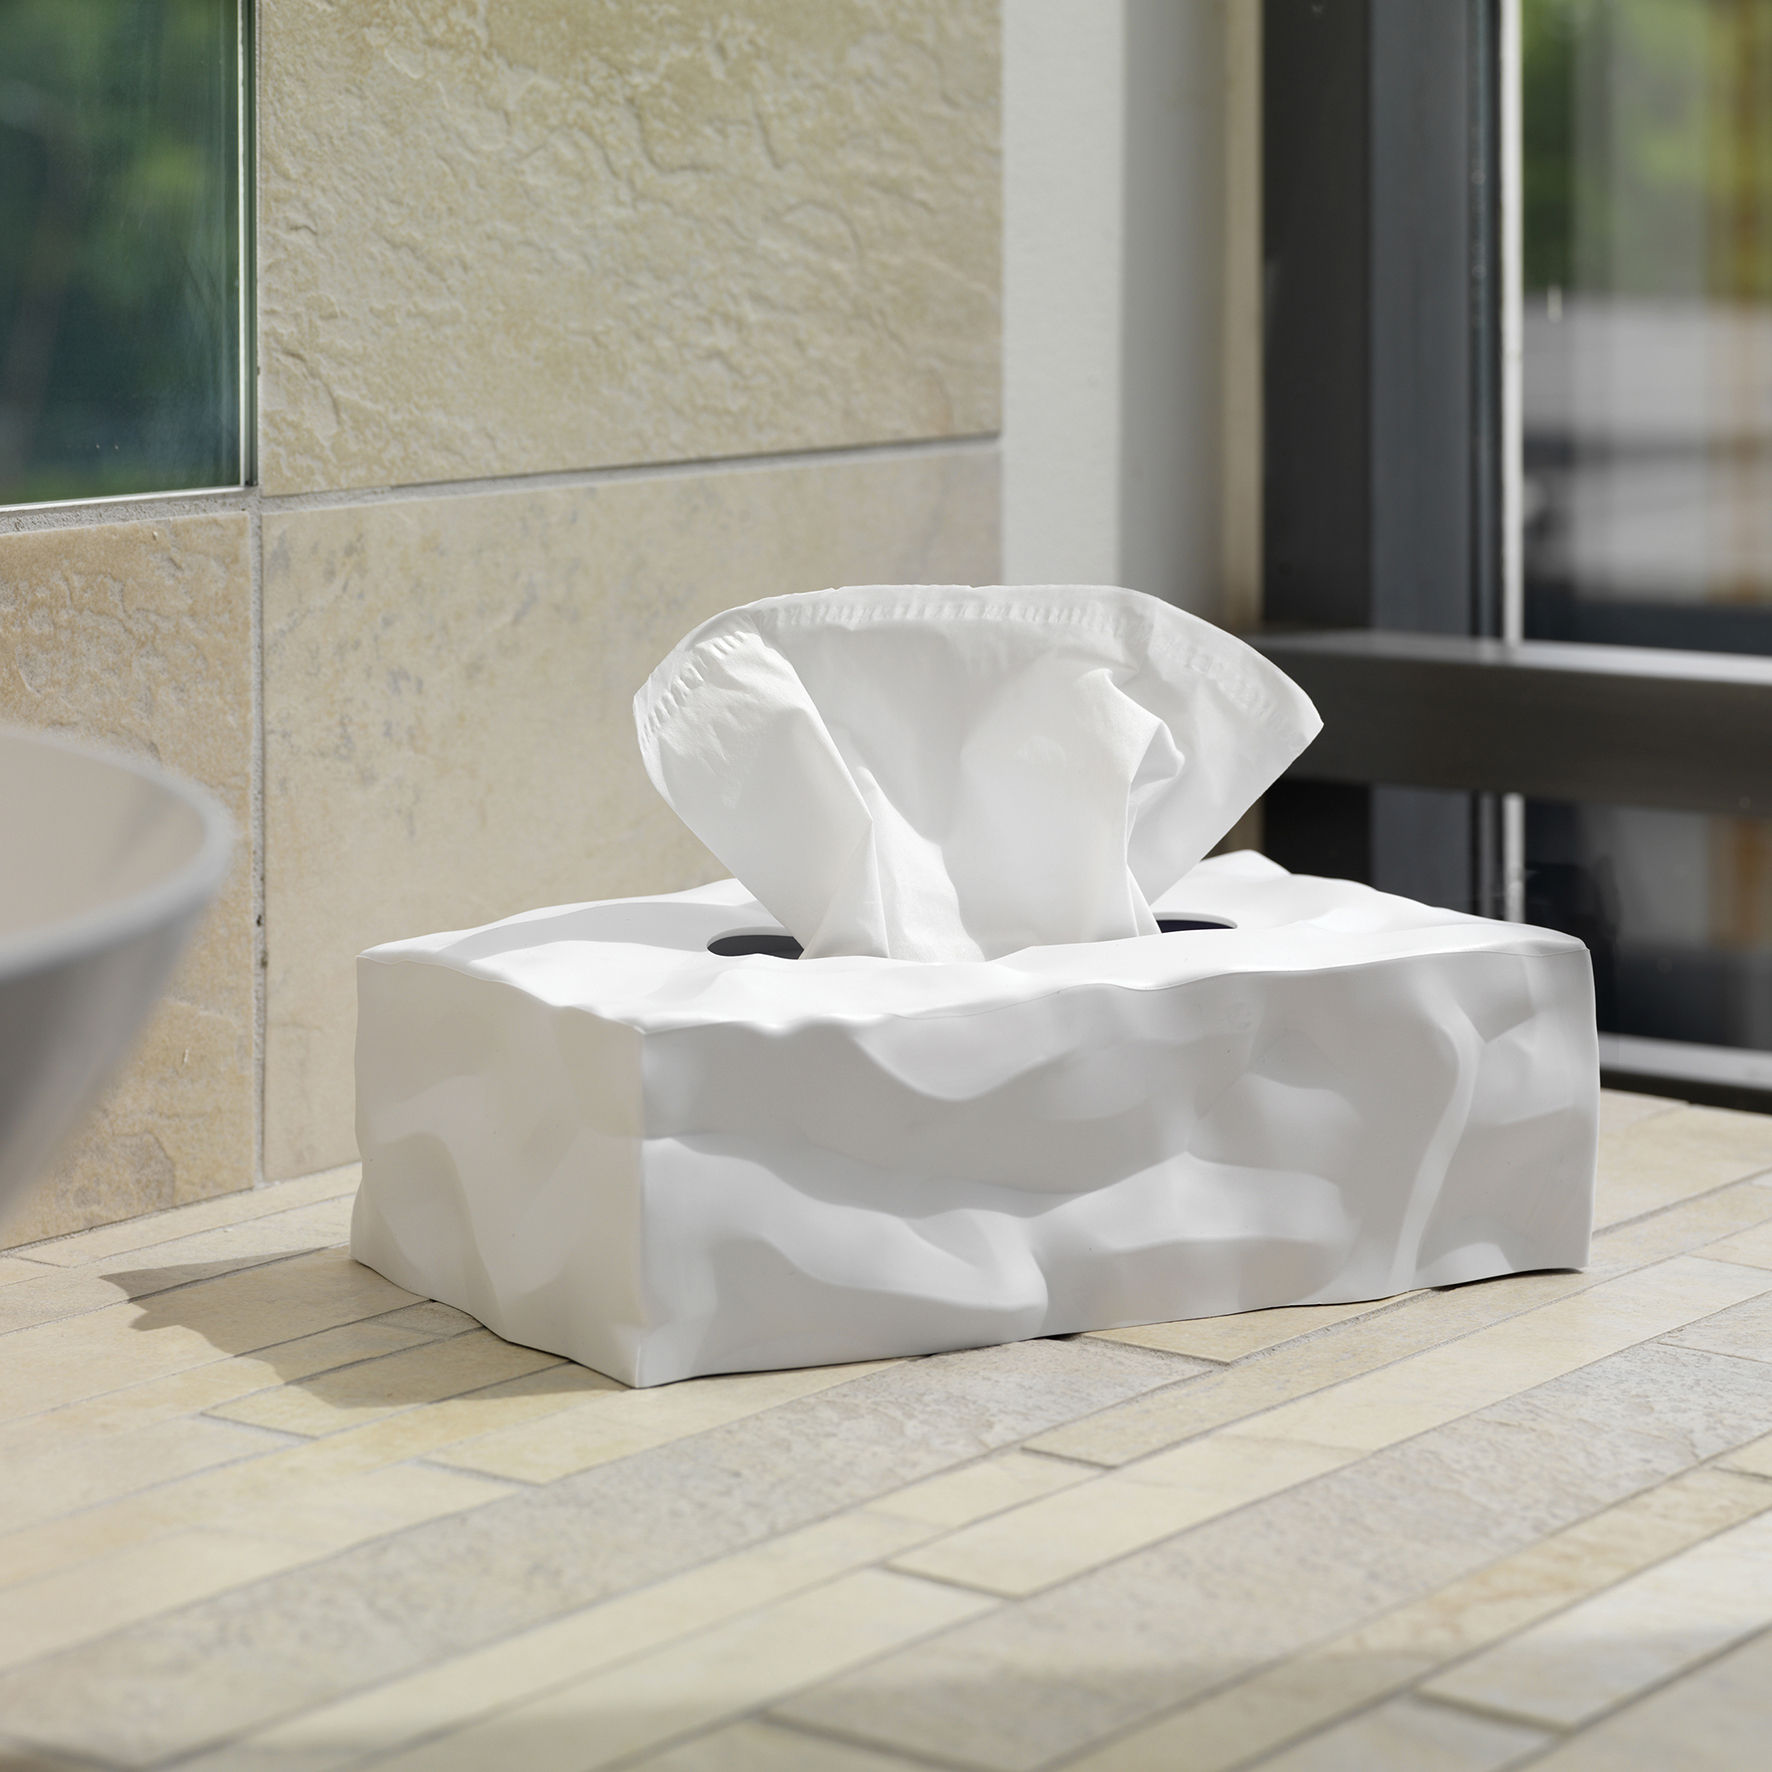 Home > Accessories > Bathroom accessories > Wipy Tissue box by Essey